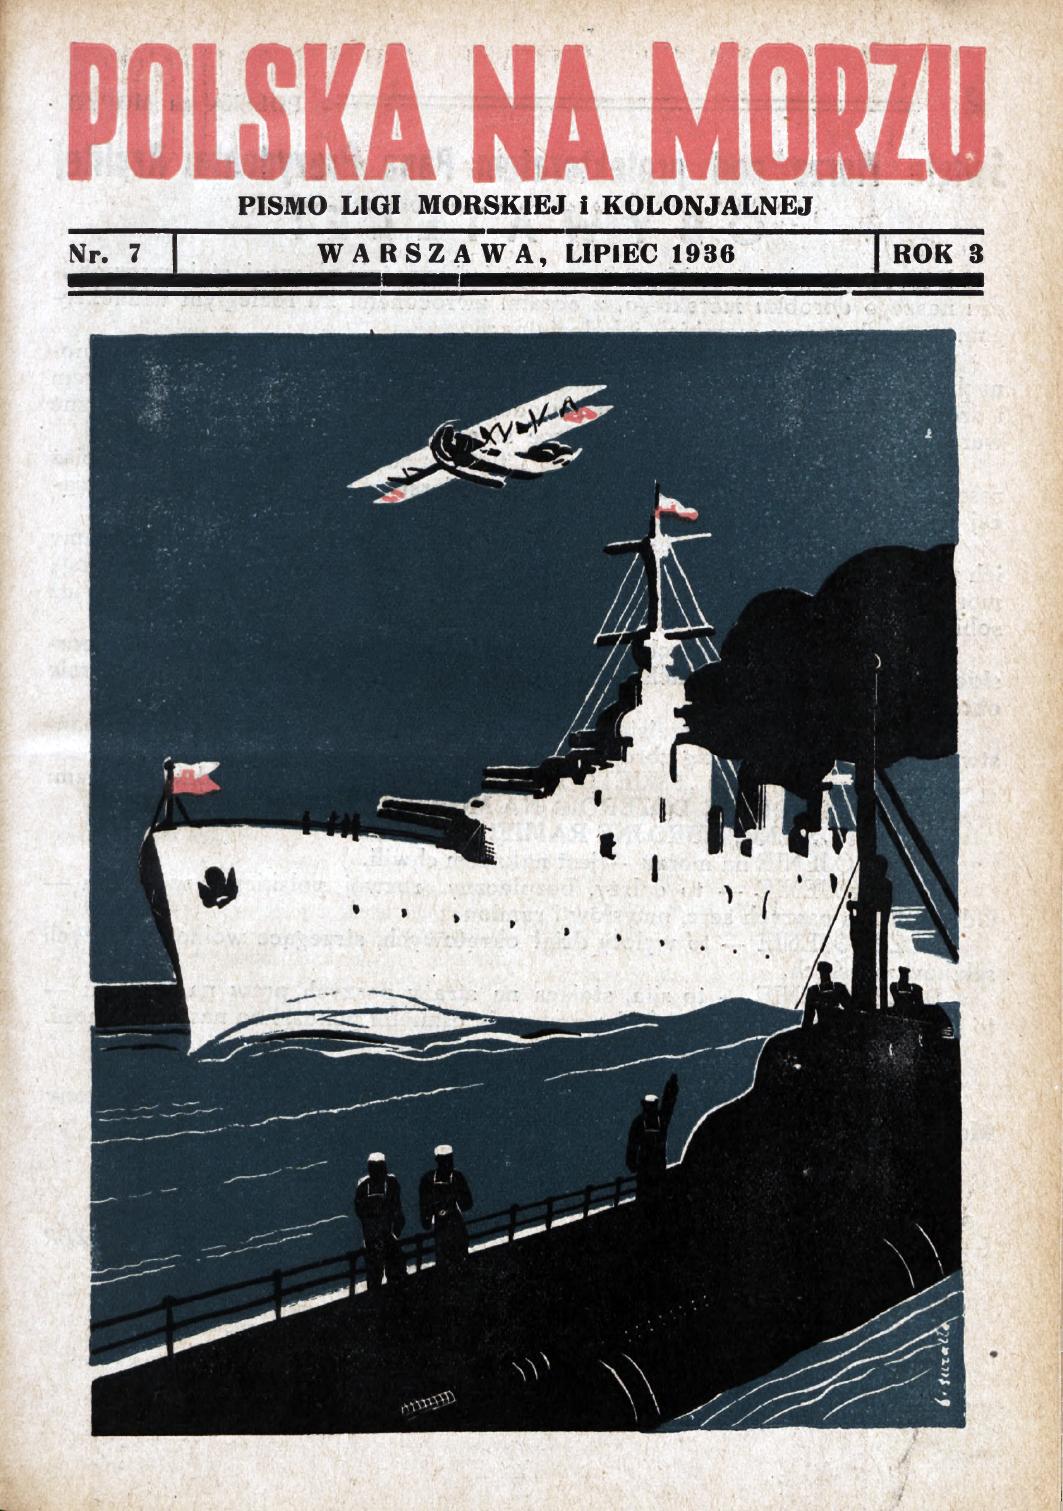 Polska na Morzu : pismo Ligi Morskiej i Kolonjalnej. - Liga Morska i Kolonjalna, 1936, nr 7